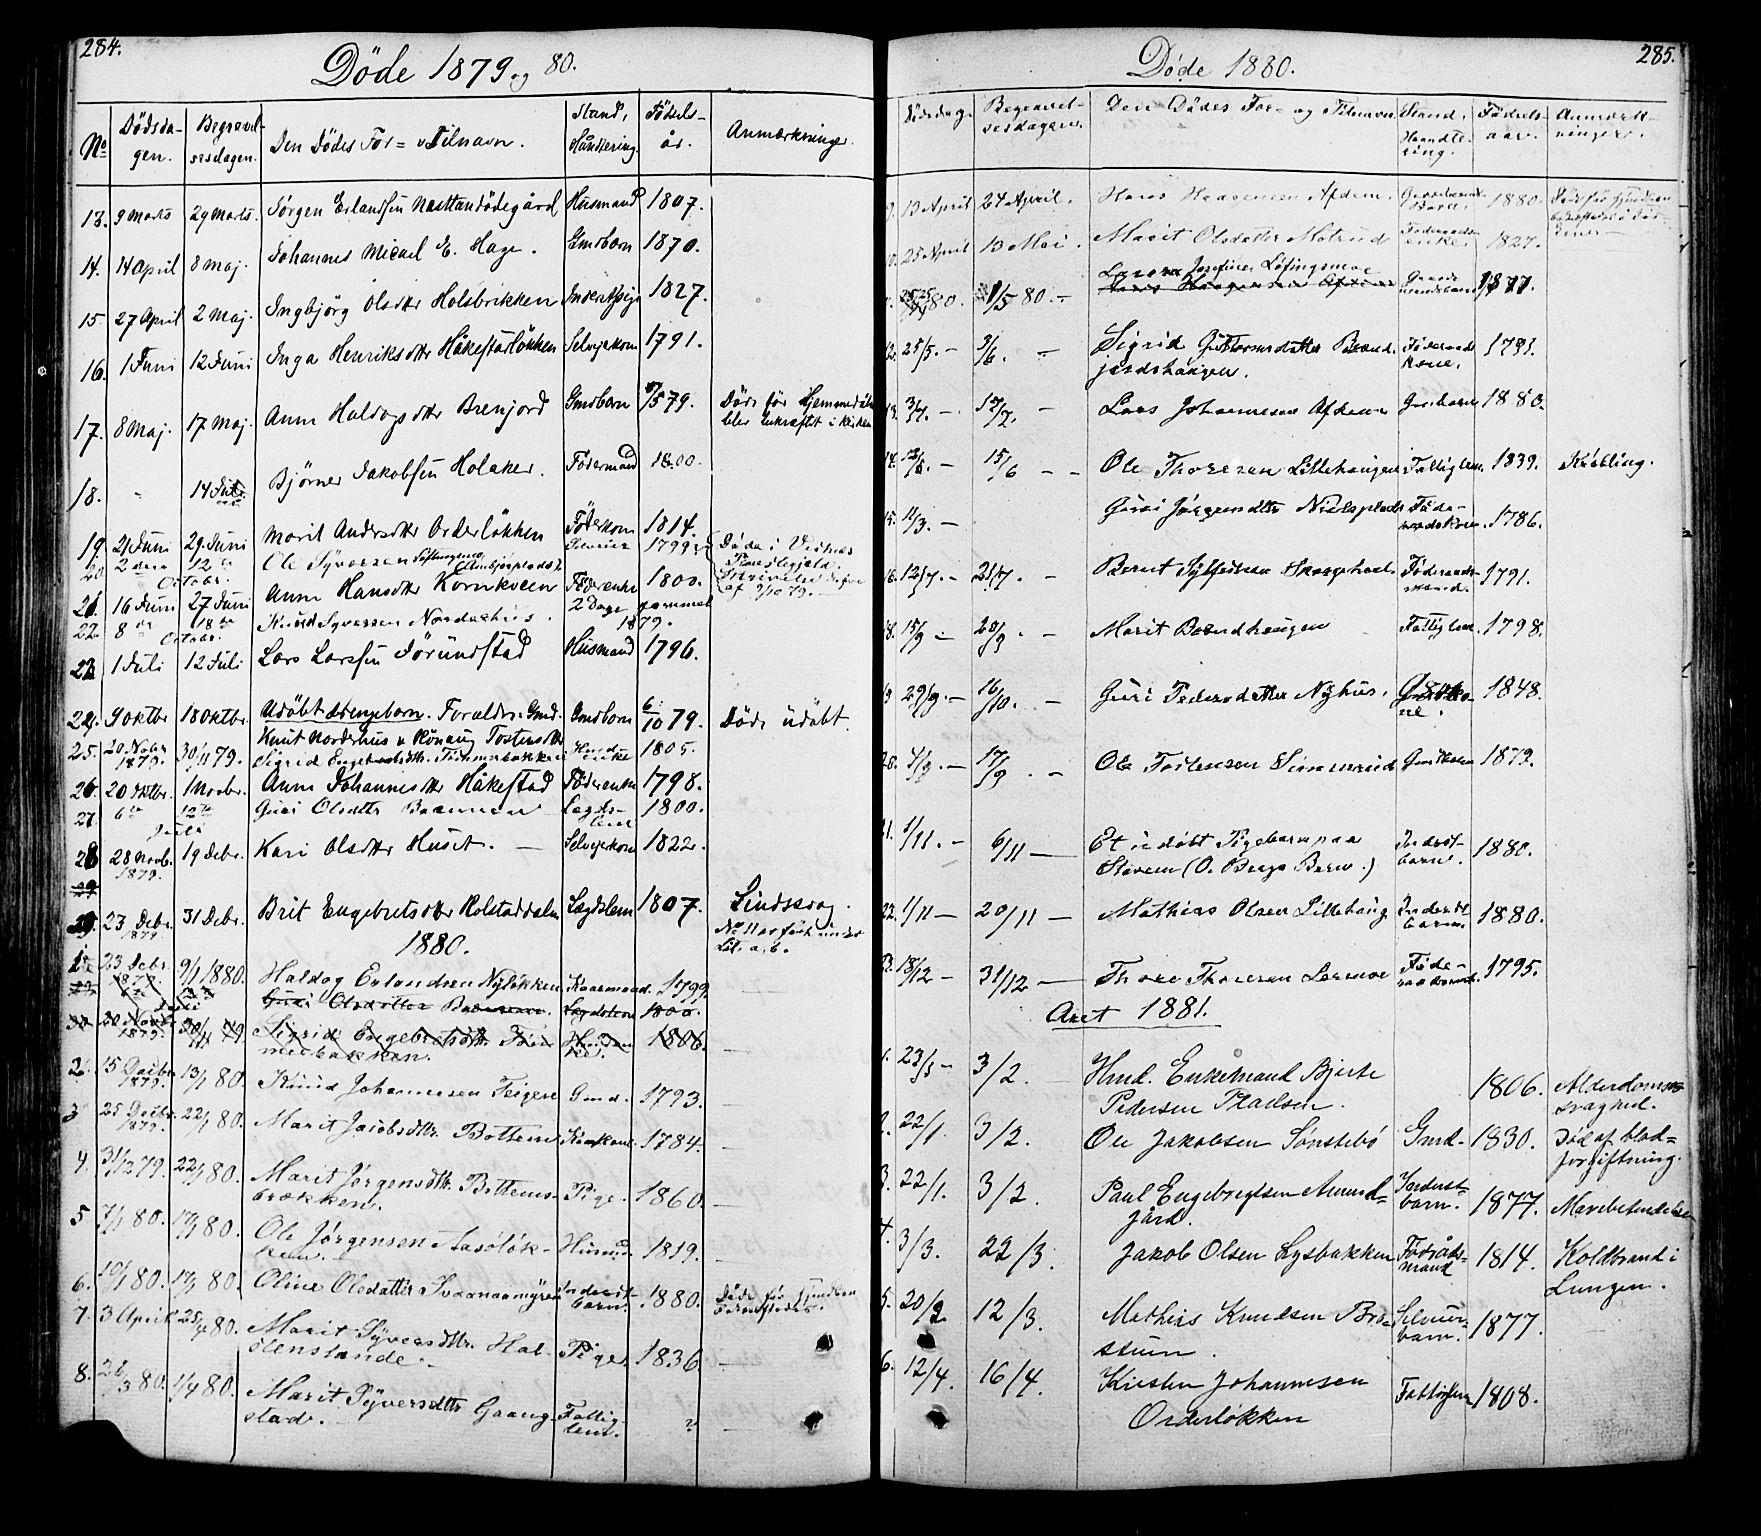 SAH, Lesja prestekontor, Klokkerbok nr. 5, 1850-1894, s. 284-285